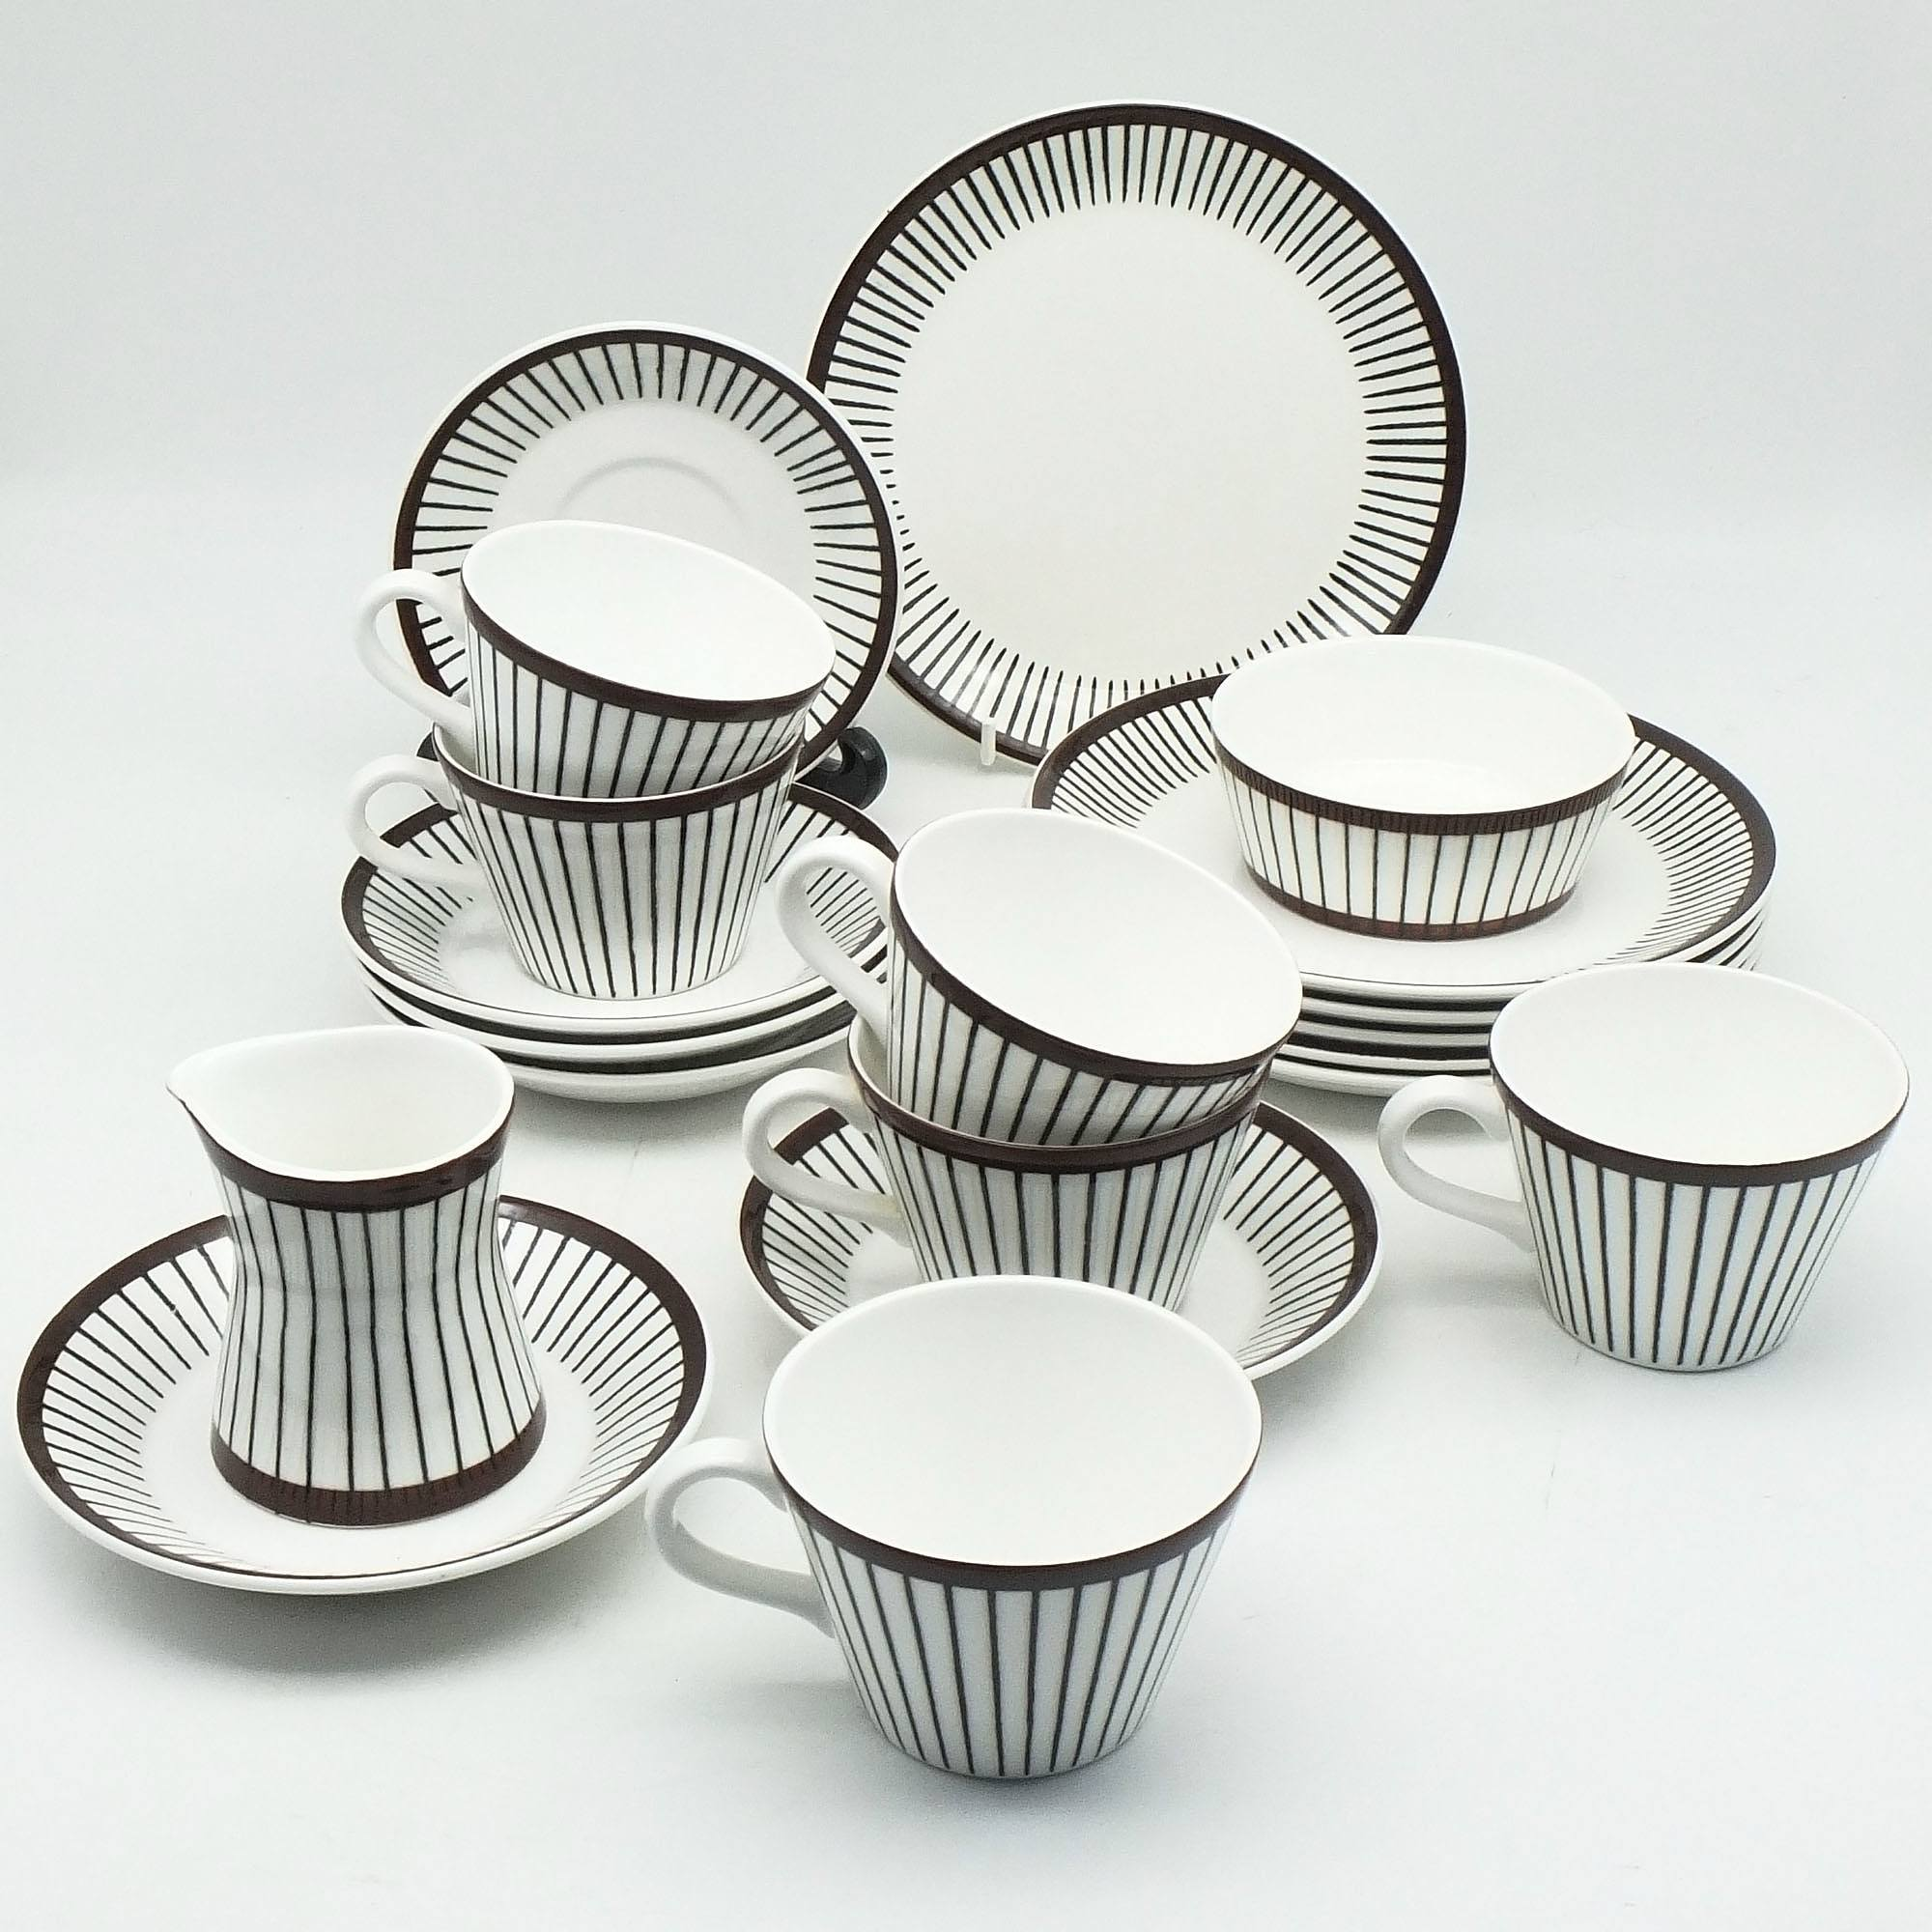 'Stig Lindberg Gustavsberg Sweden Spisa Ribb Tea Service for Six'